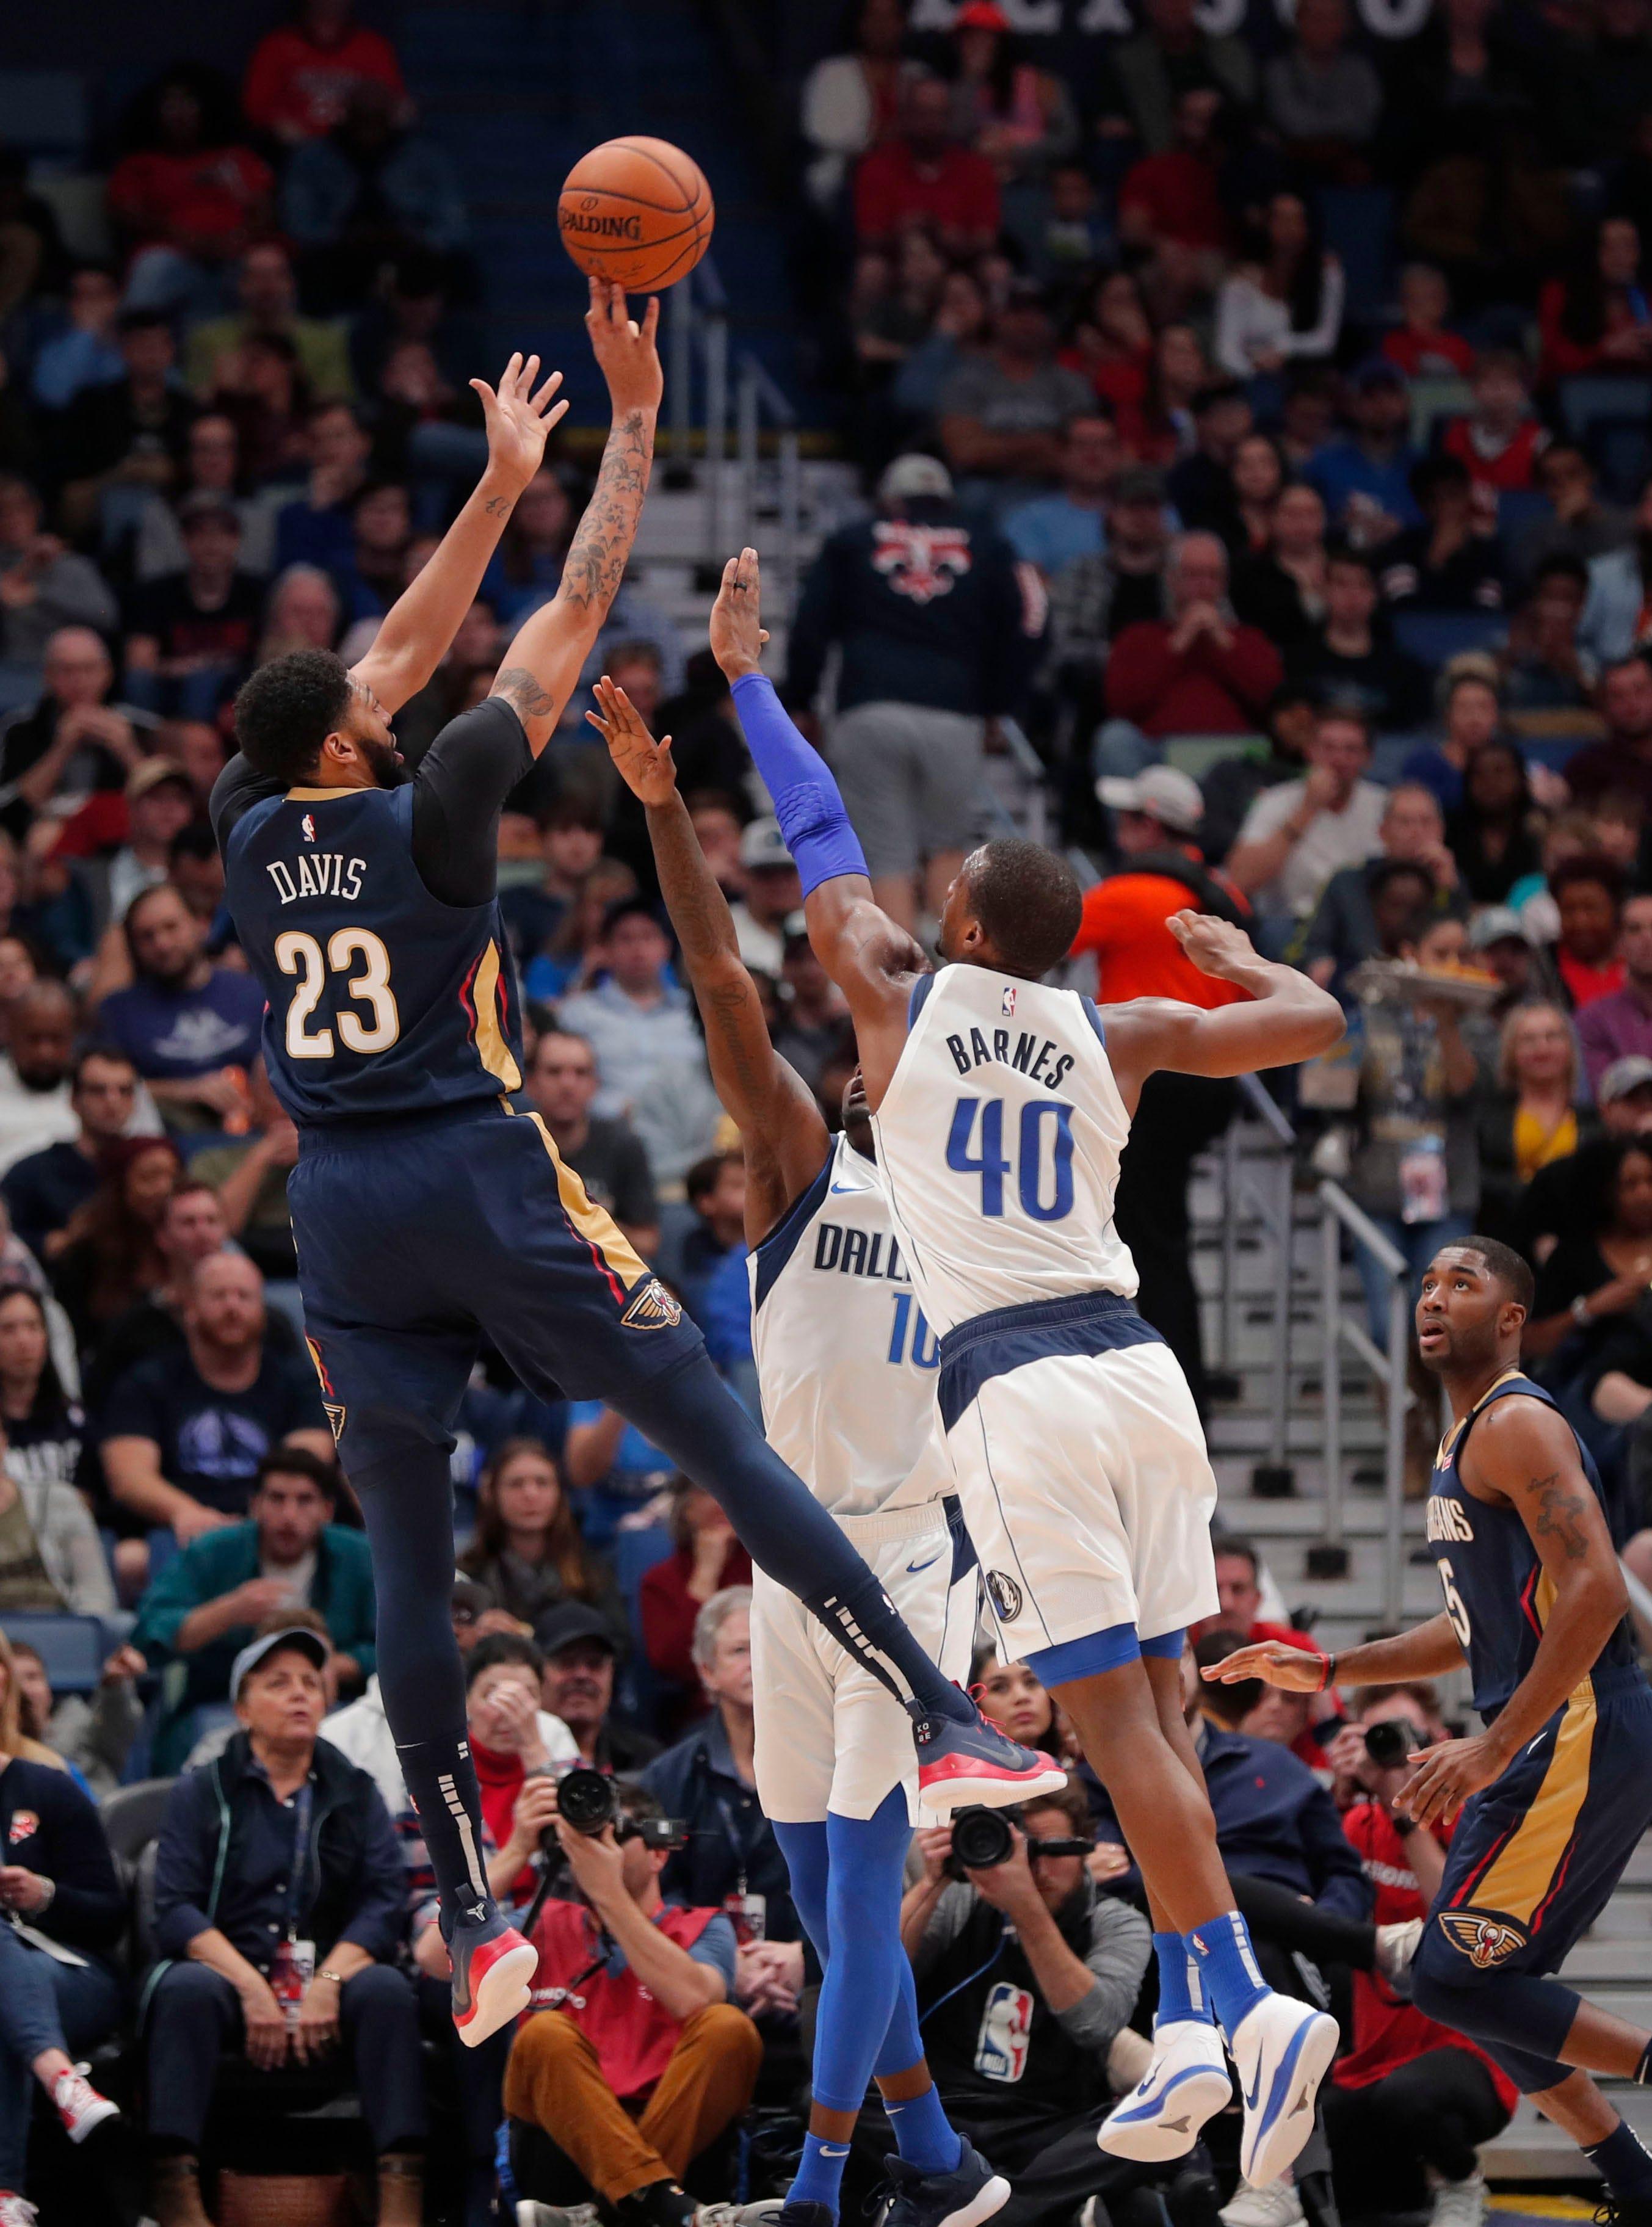 Pelicans star Anthony Davis drops season-high 48 points in monster game vs. Mavericks